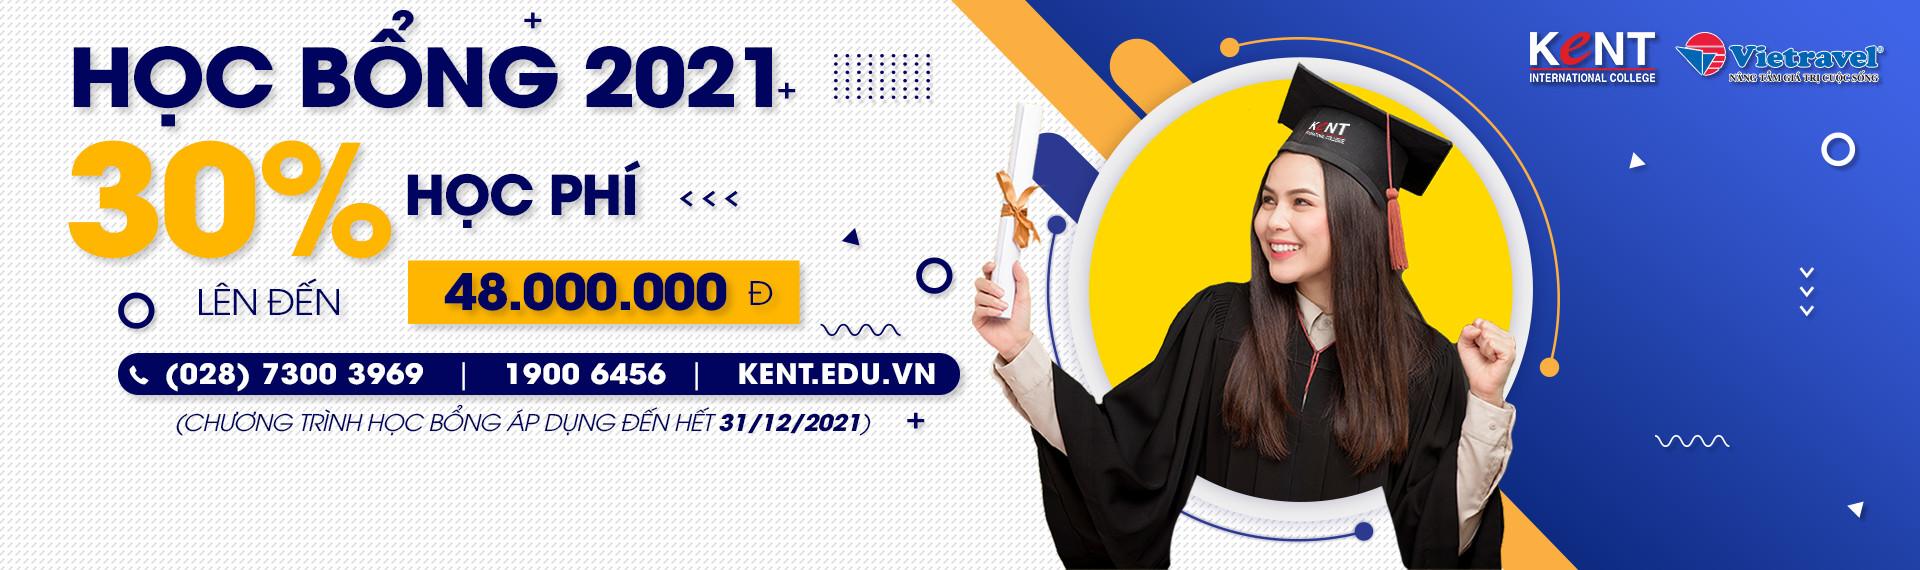 Học bổng Kent 2021